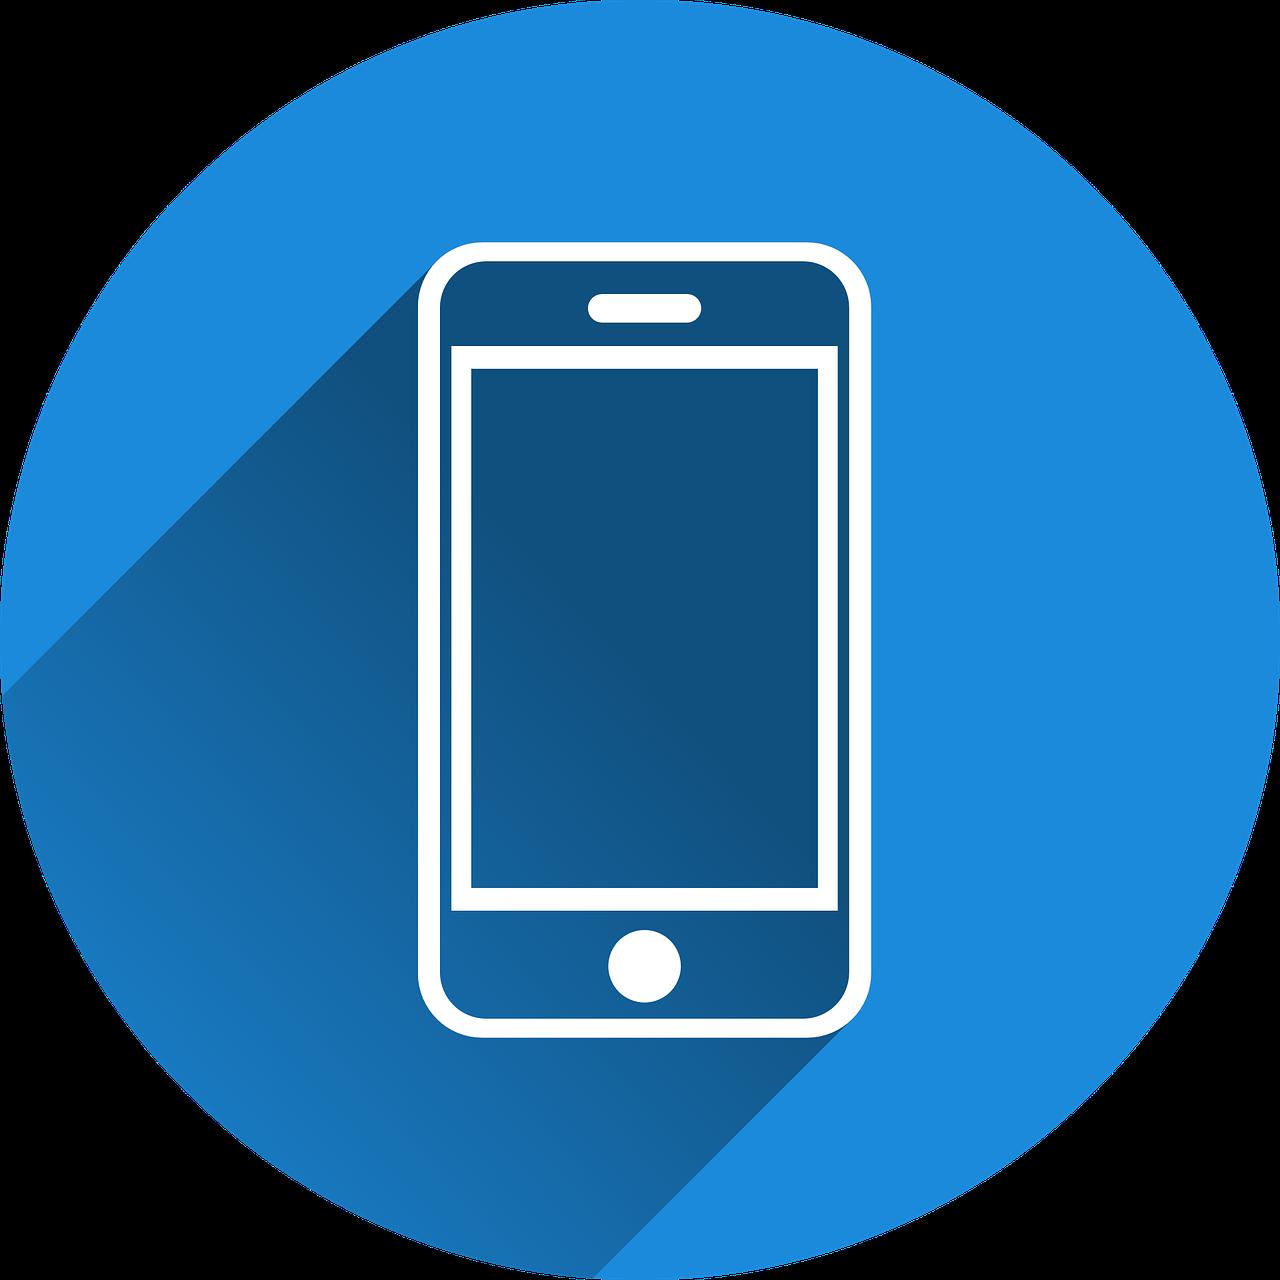 smartphone, mobile phone, phone